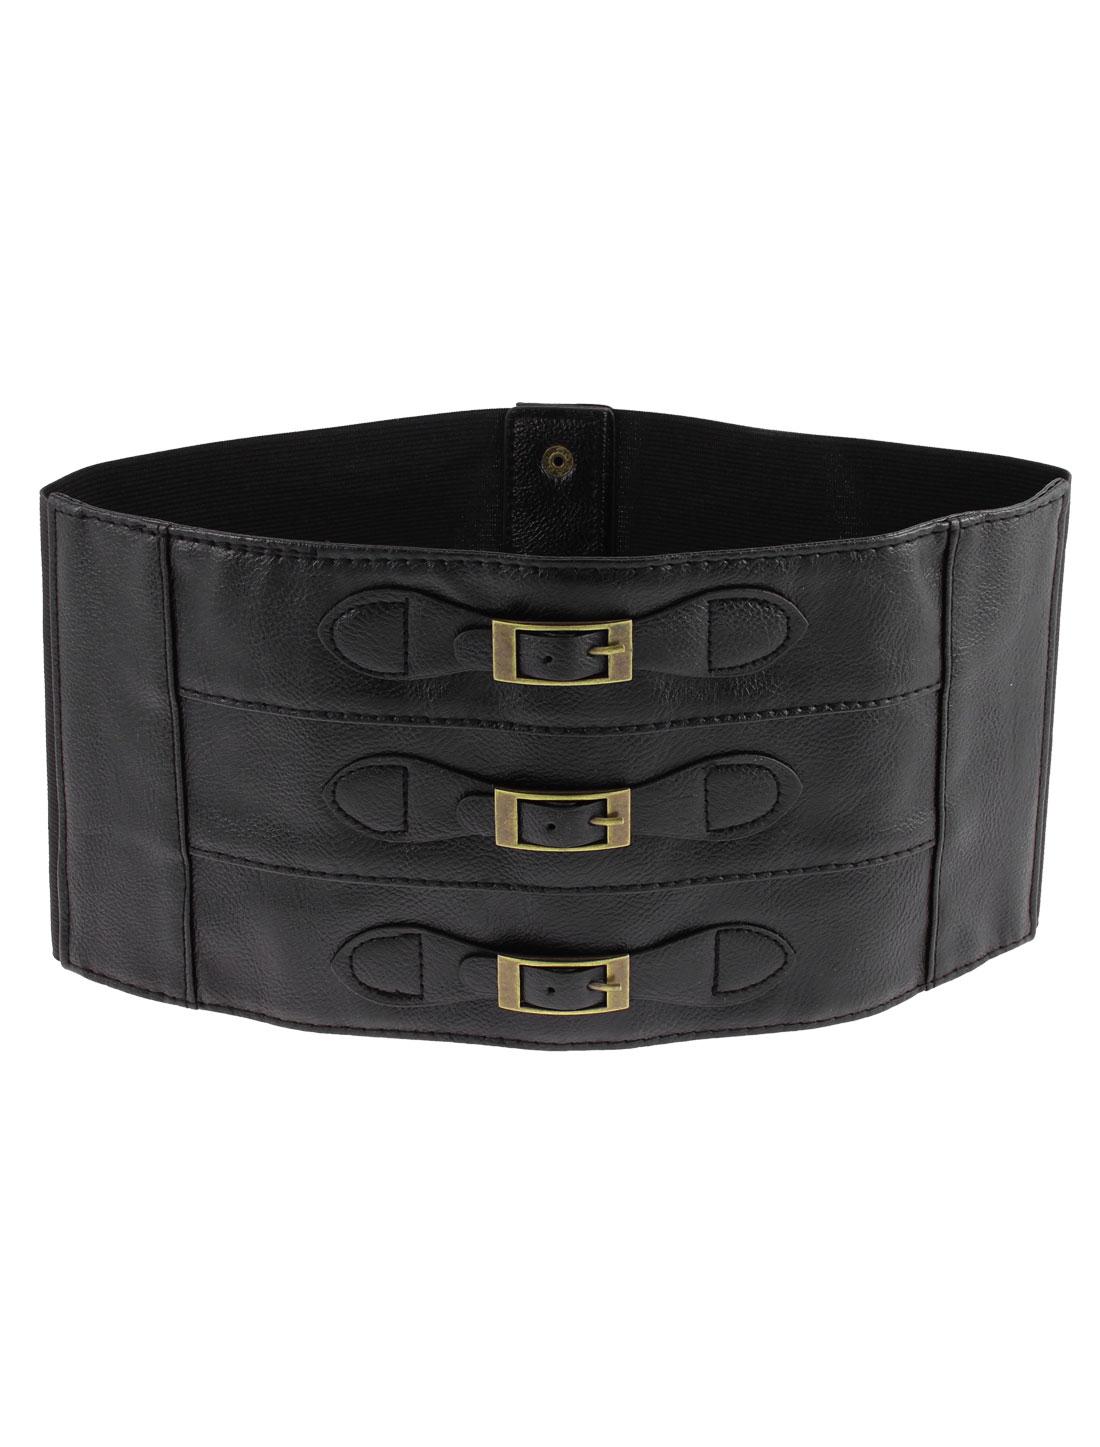 Press Button Single Row Buckle Elastic Corset Waist Cinch Belt Band 73cm Length